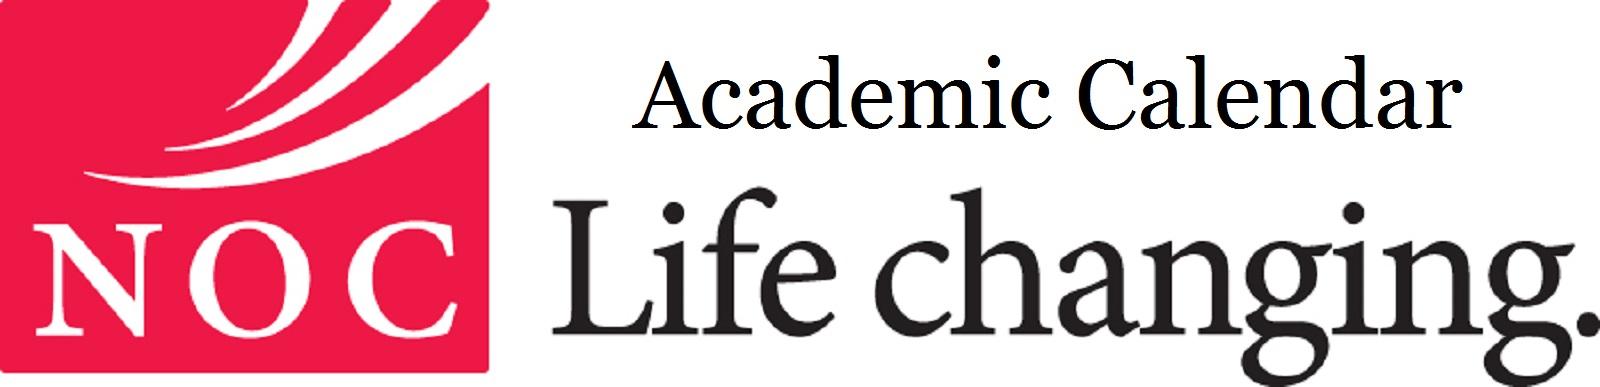 NOC Life Changing Tagline